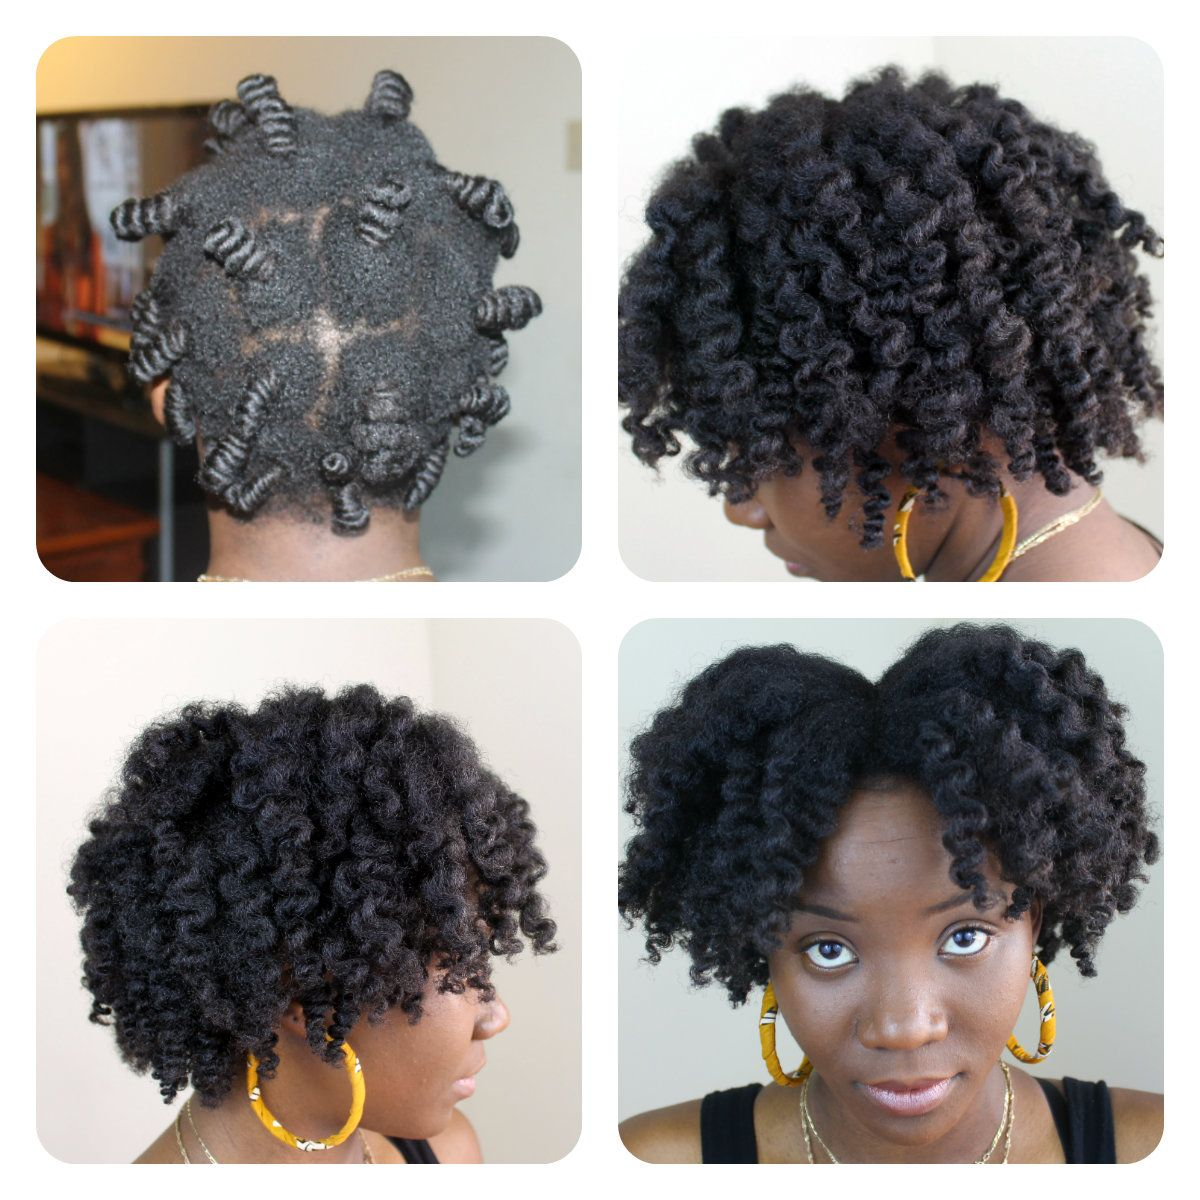 Bantu Knot Out... New Do Pinterest